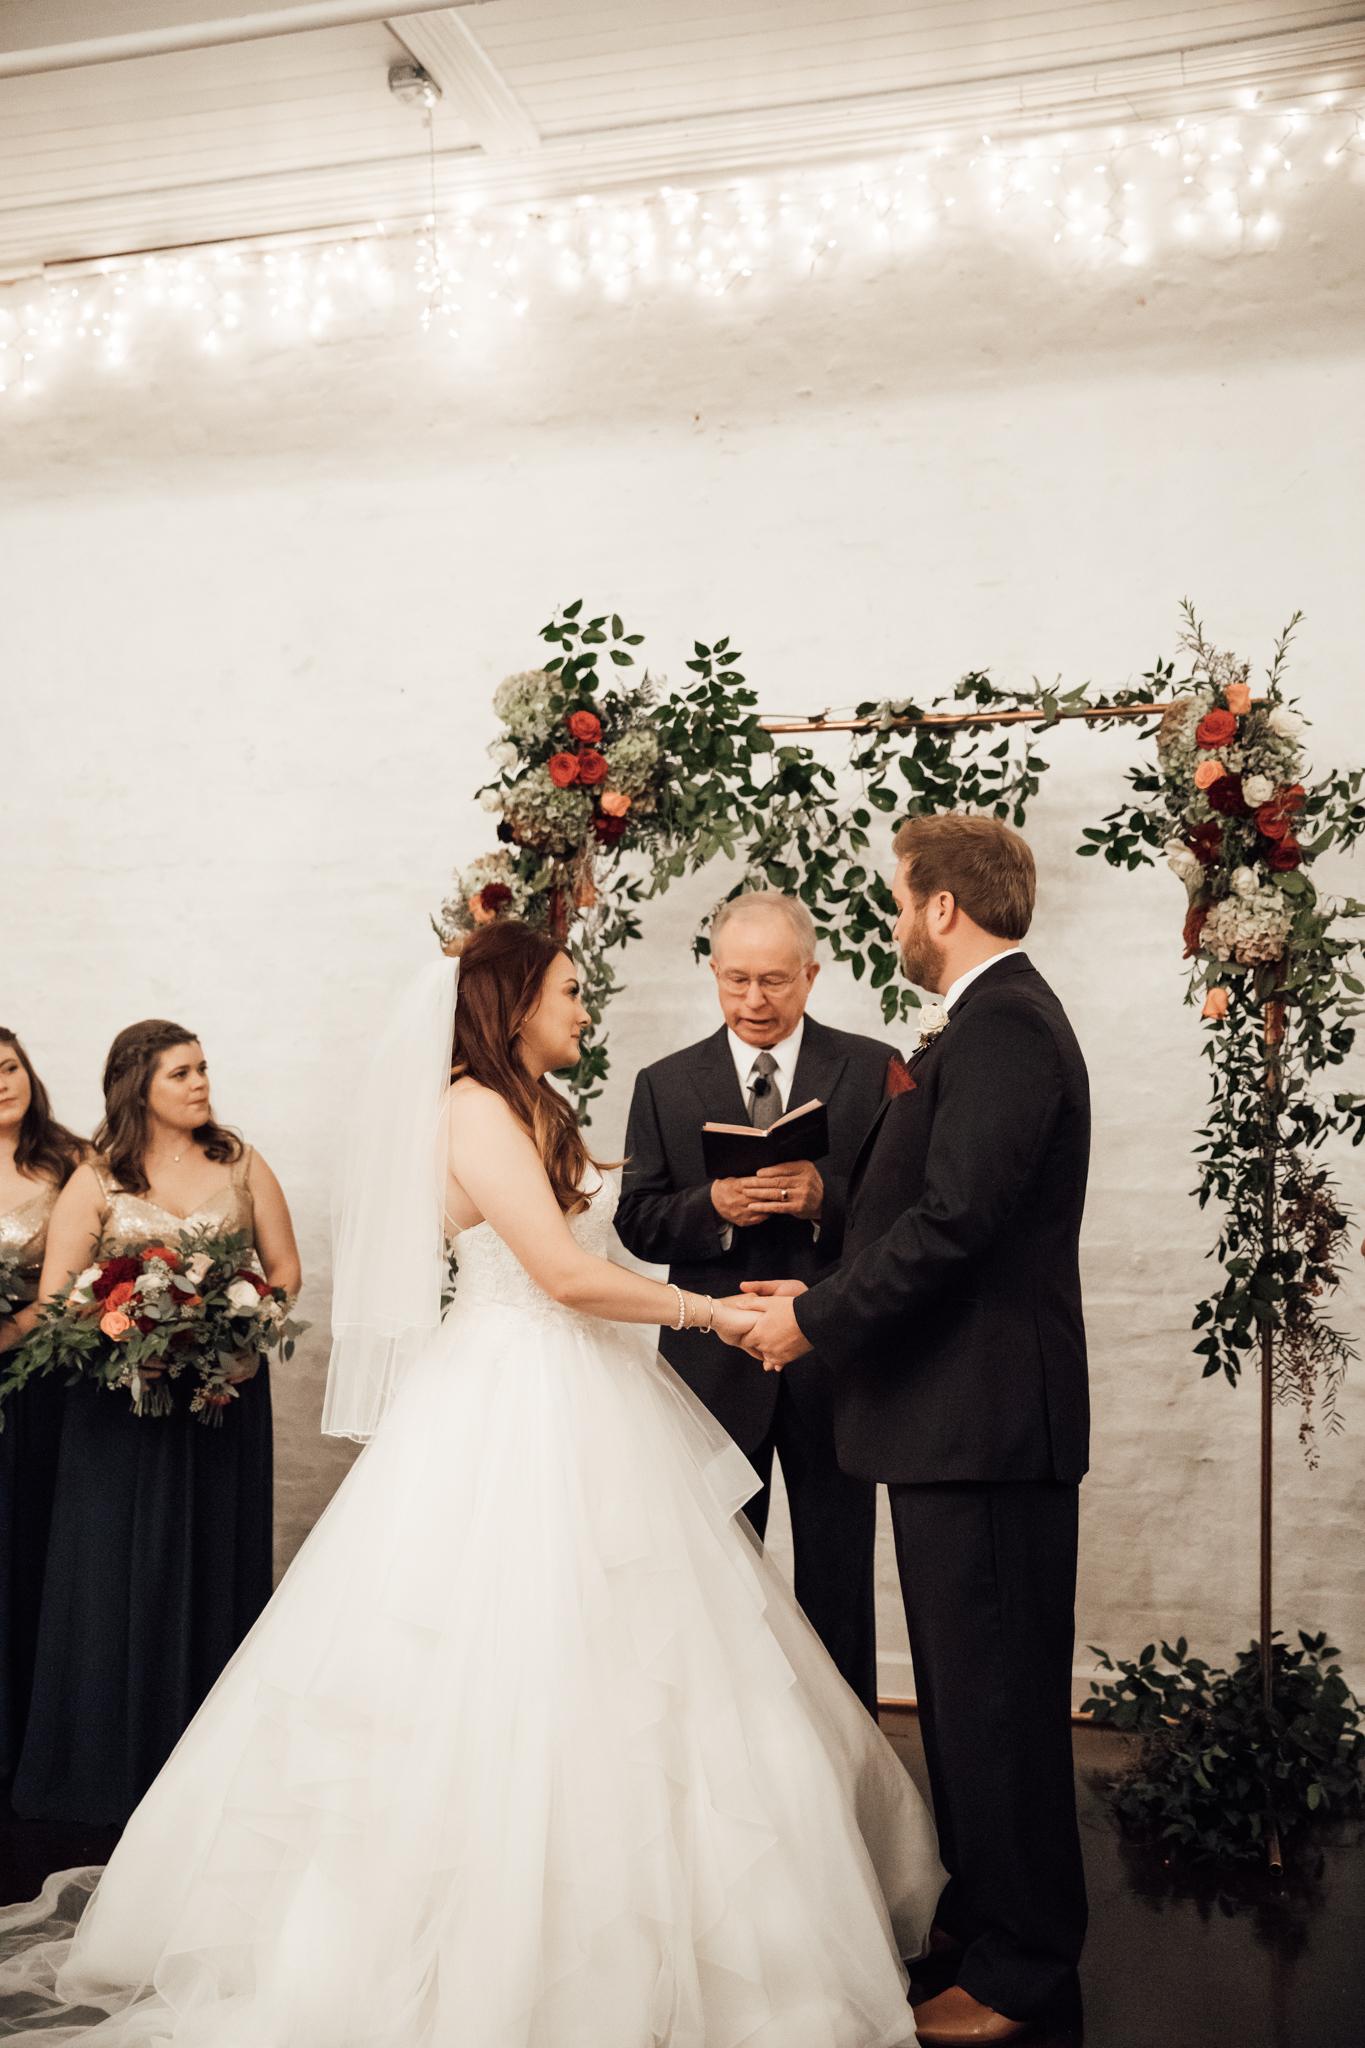 memphis-wedding-photographers-thewarmtharoundyou-ballinese-ballroom (147 of 232).jpg